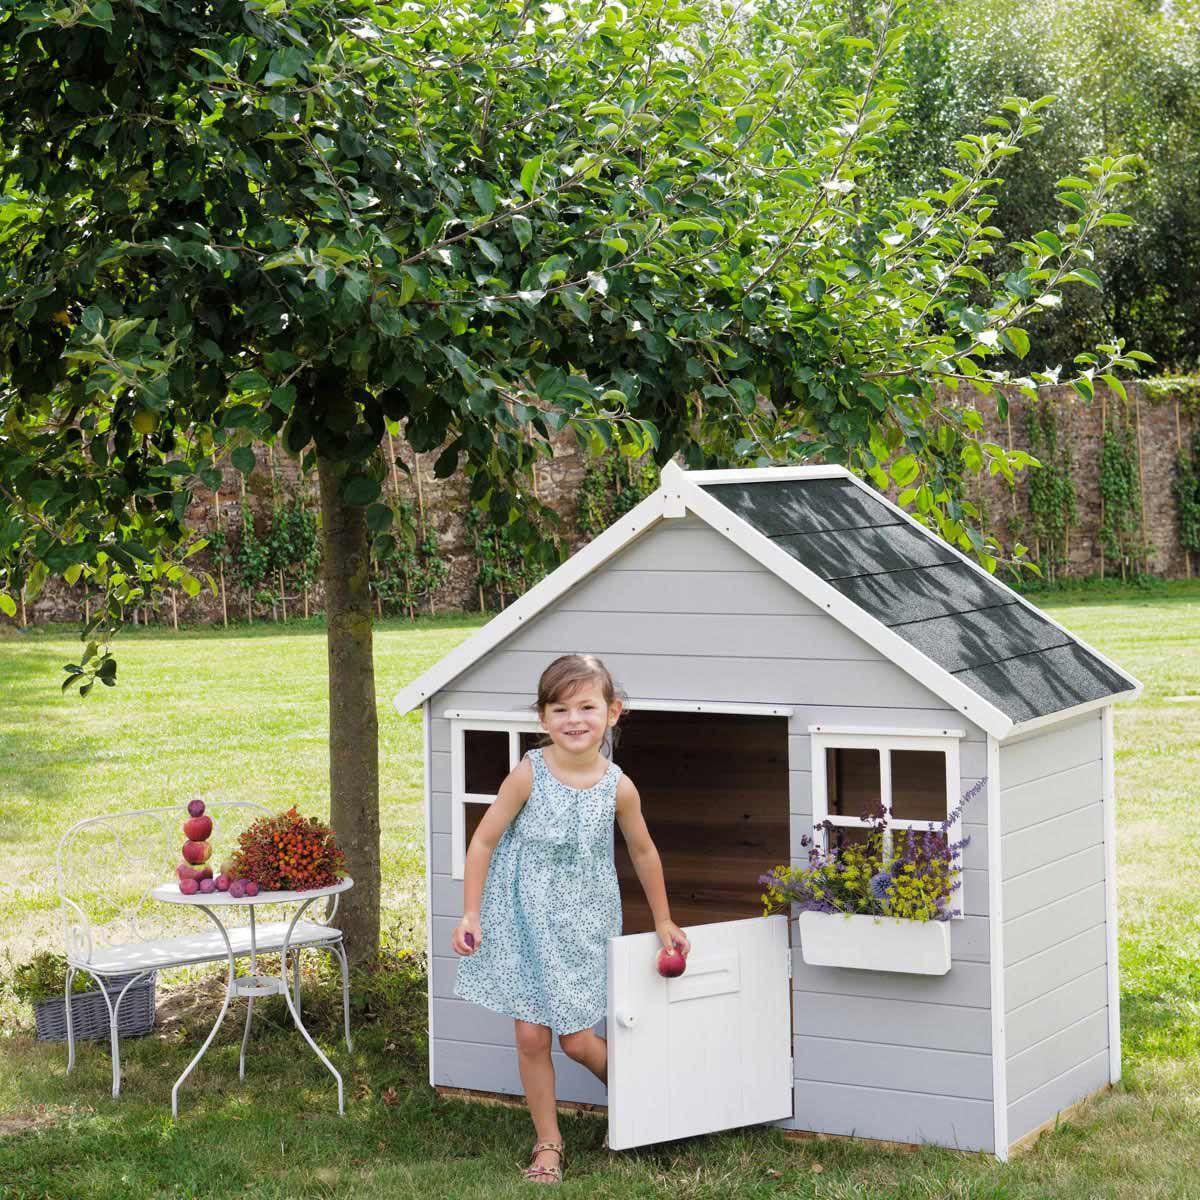 Cabane de jardin enfant grise LOLA - Collection 2013   Outdoor ...